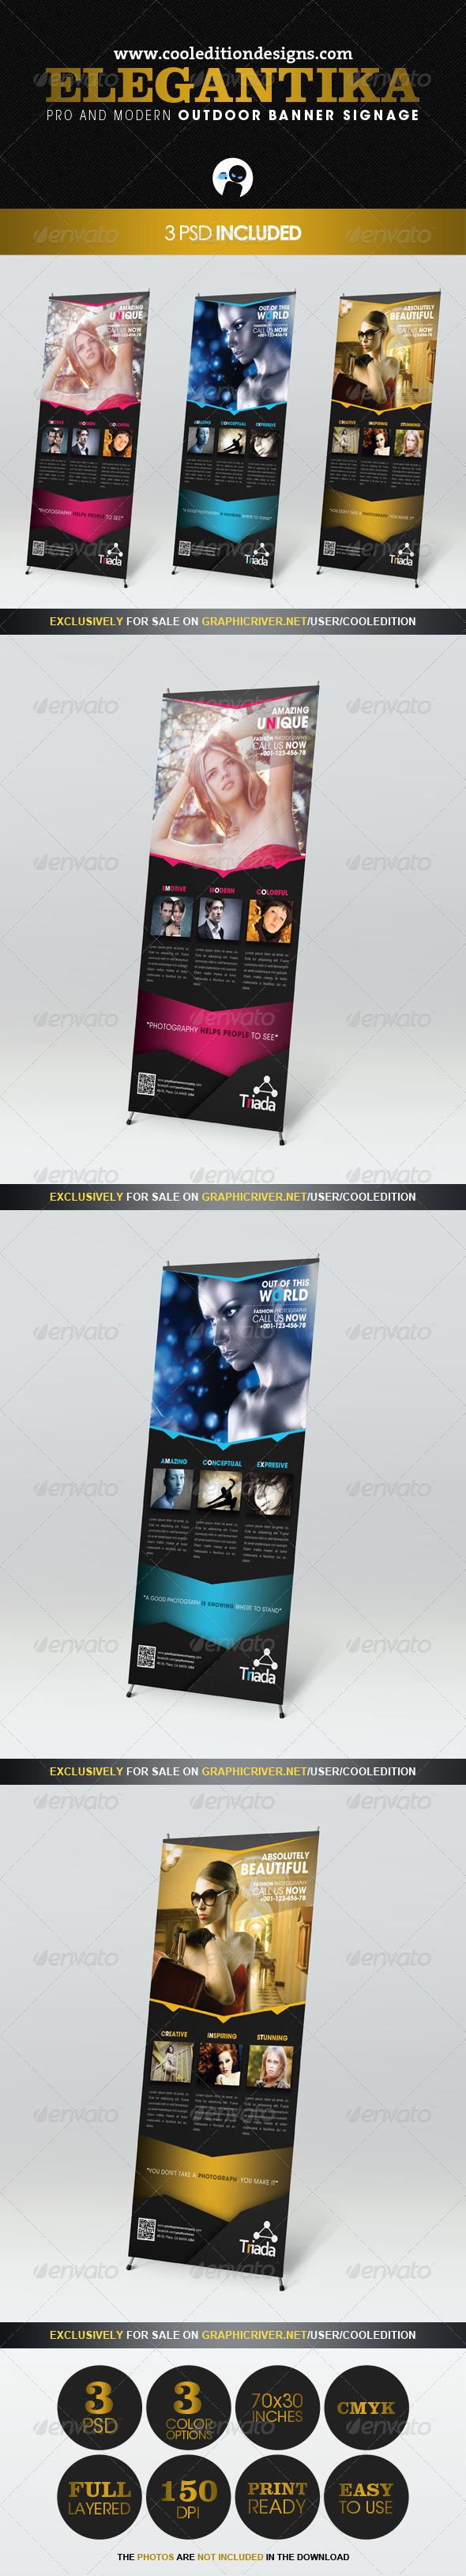 Elegantika - Pro & Modern Outdoor Banner Signage - Signage Print Templates